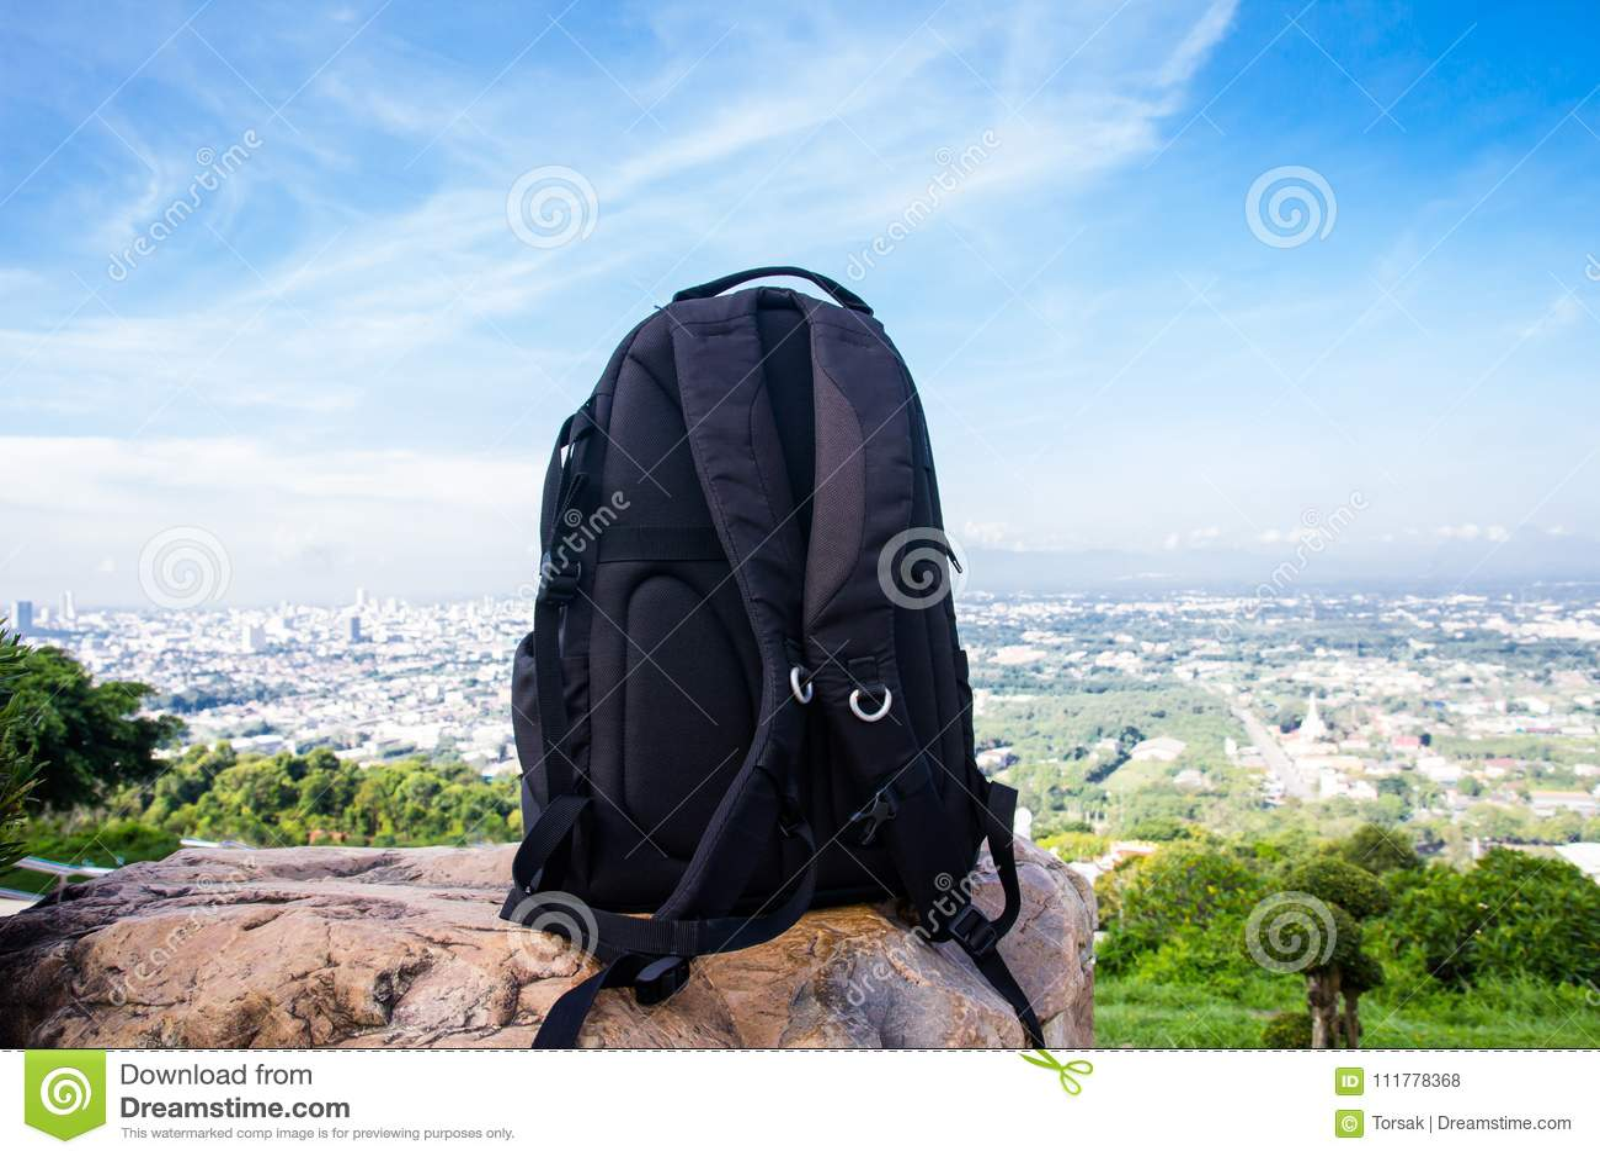 Backpack for traveler on the stone